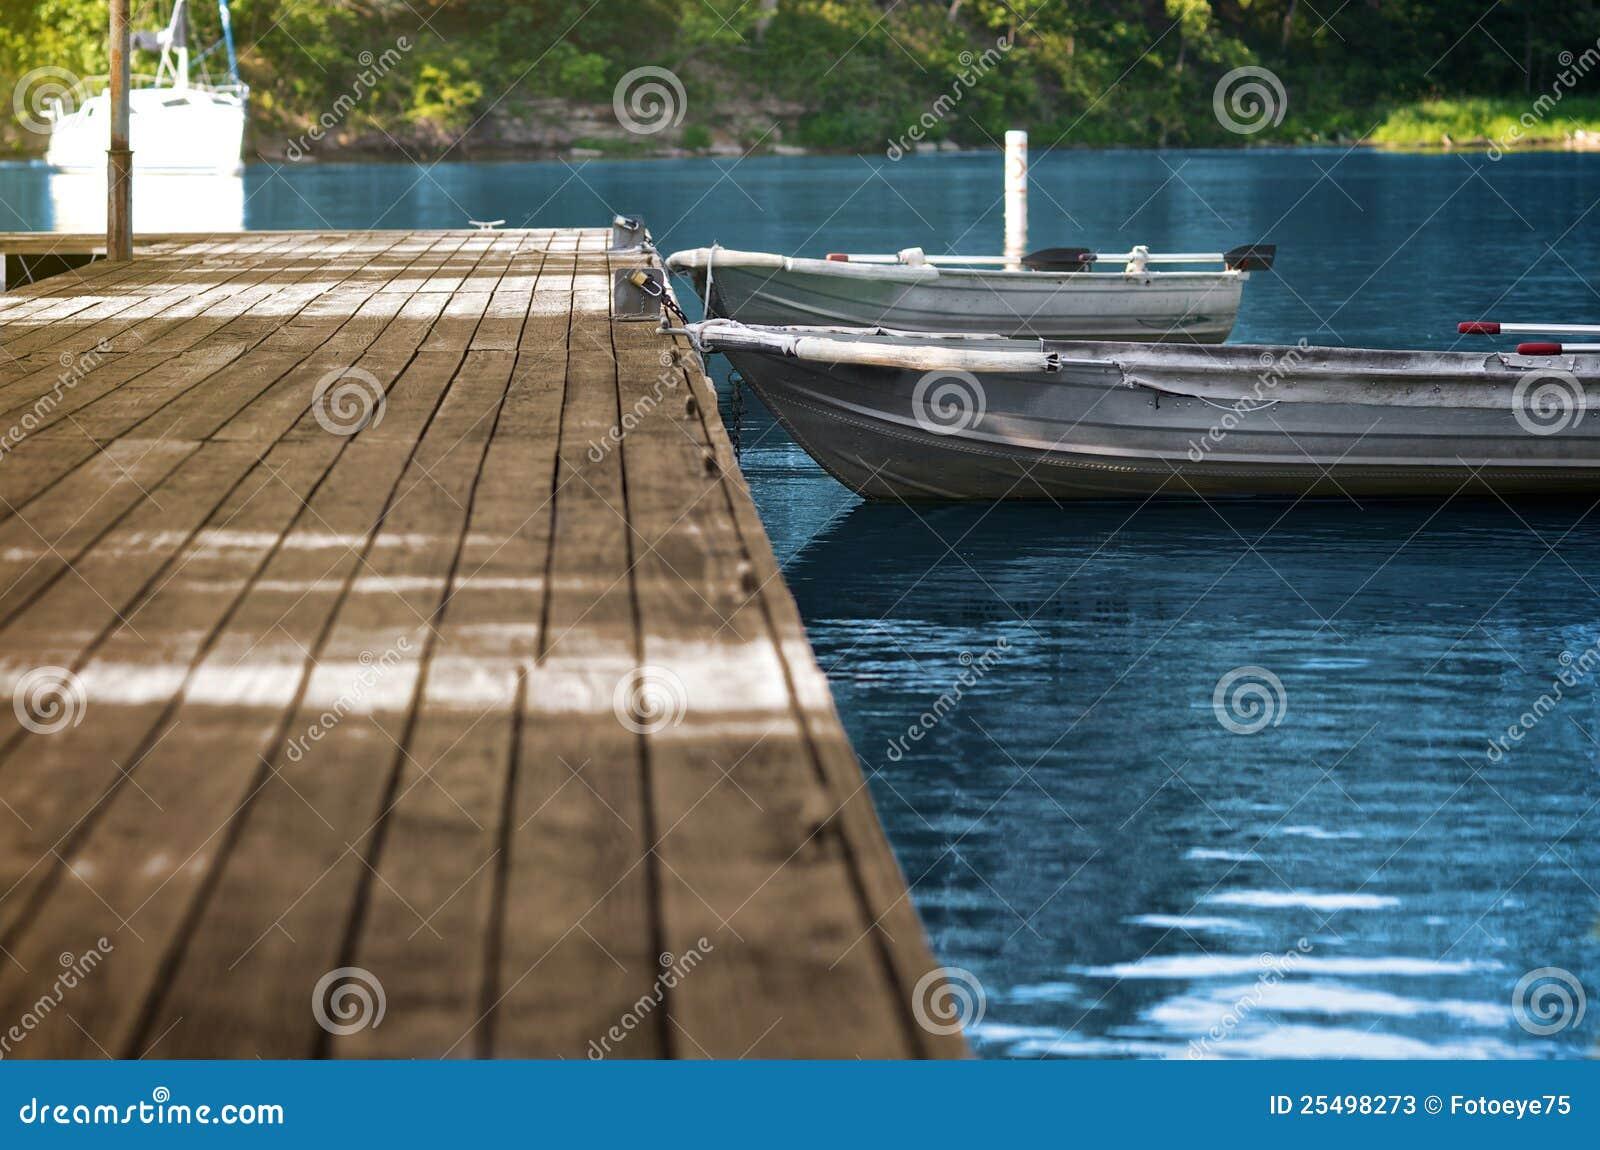 Aluminum fishing boats at wood dock stock image image for Fishing docks near me